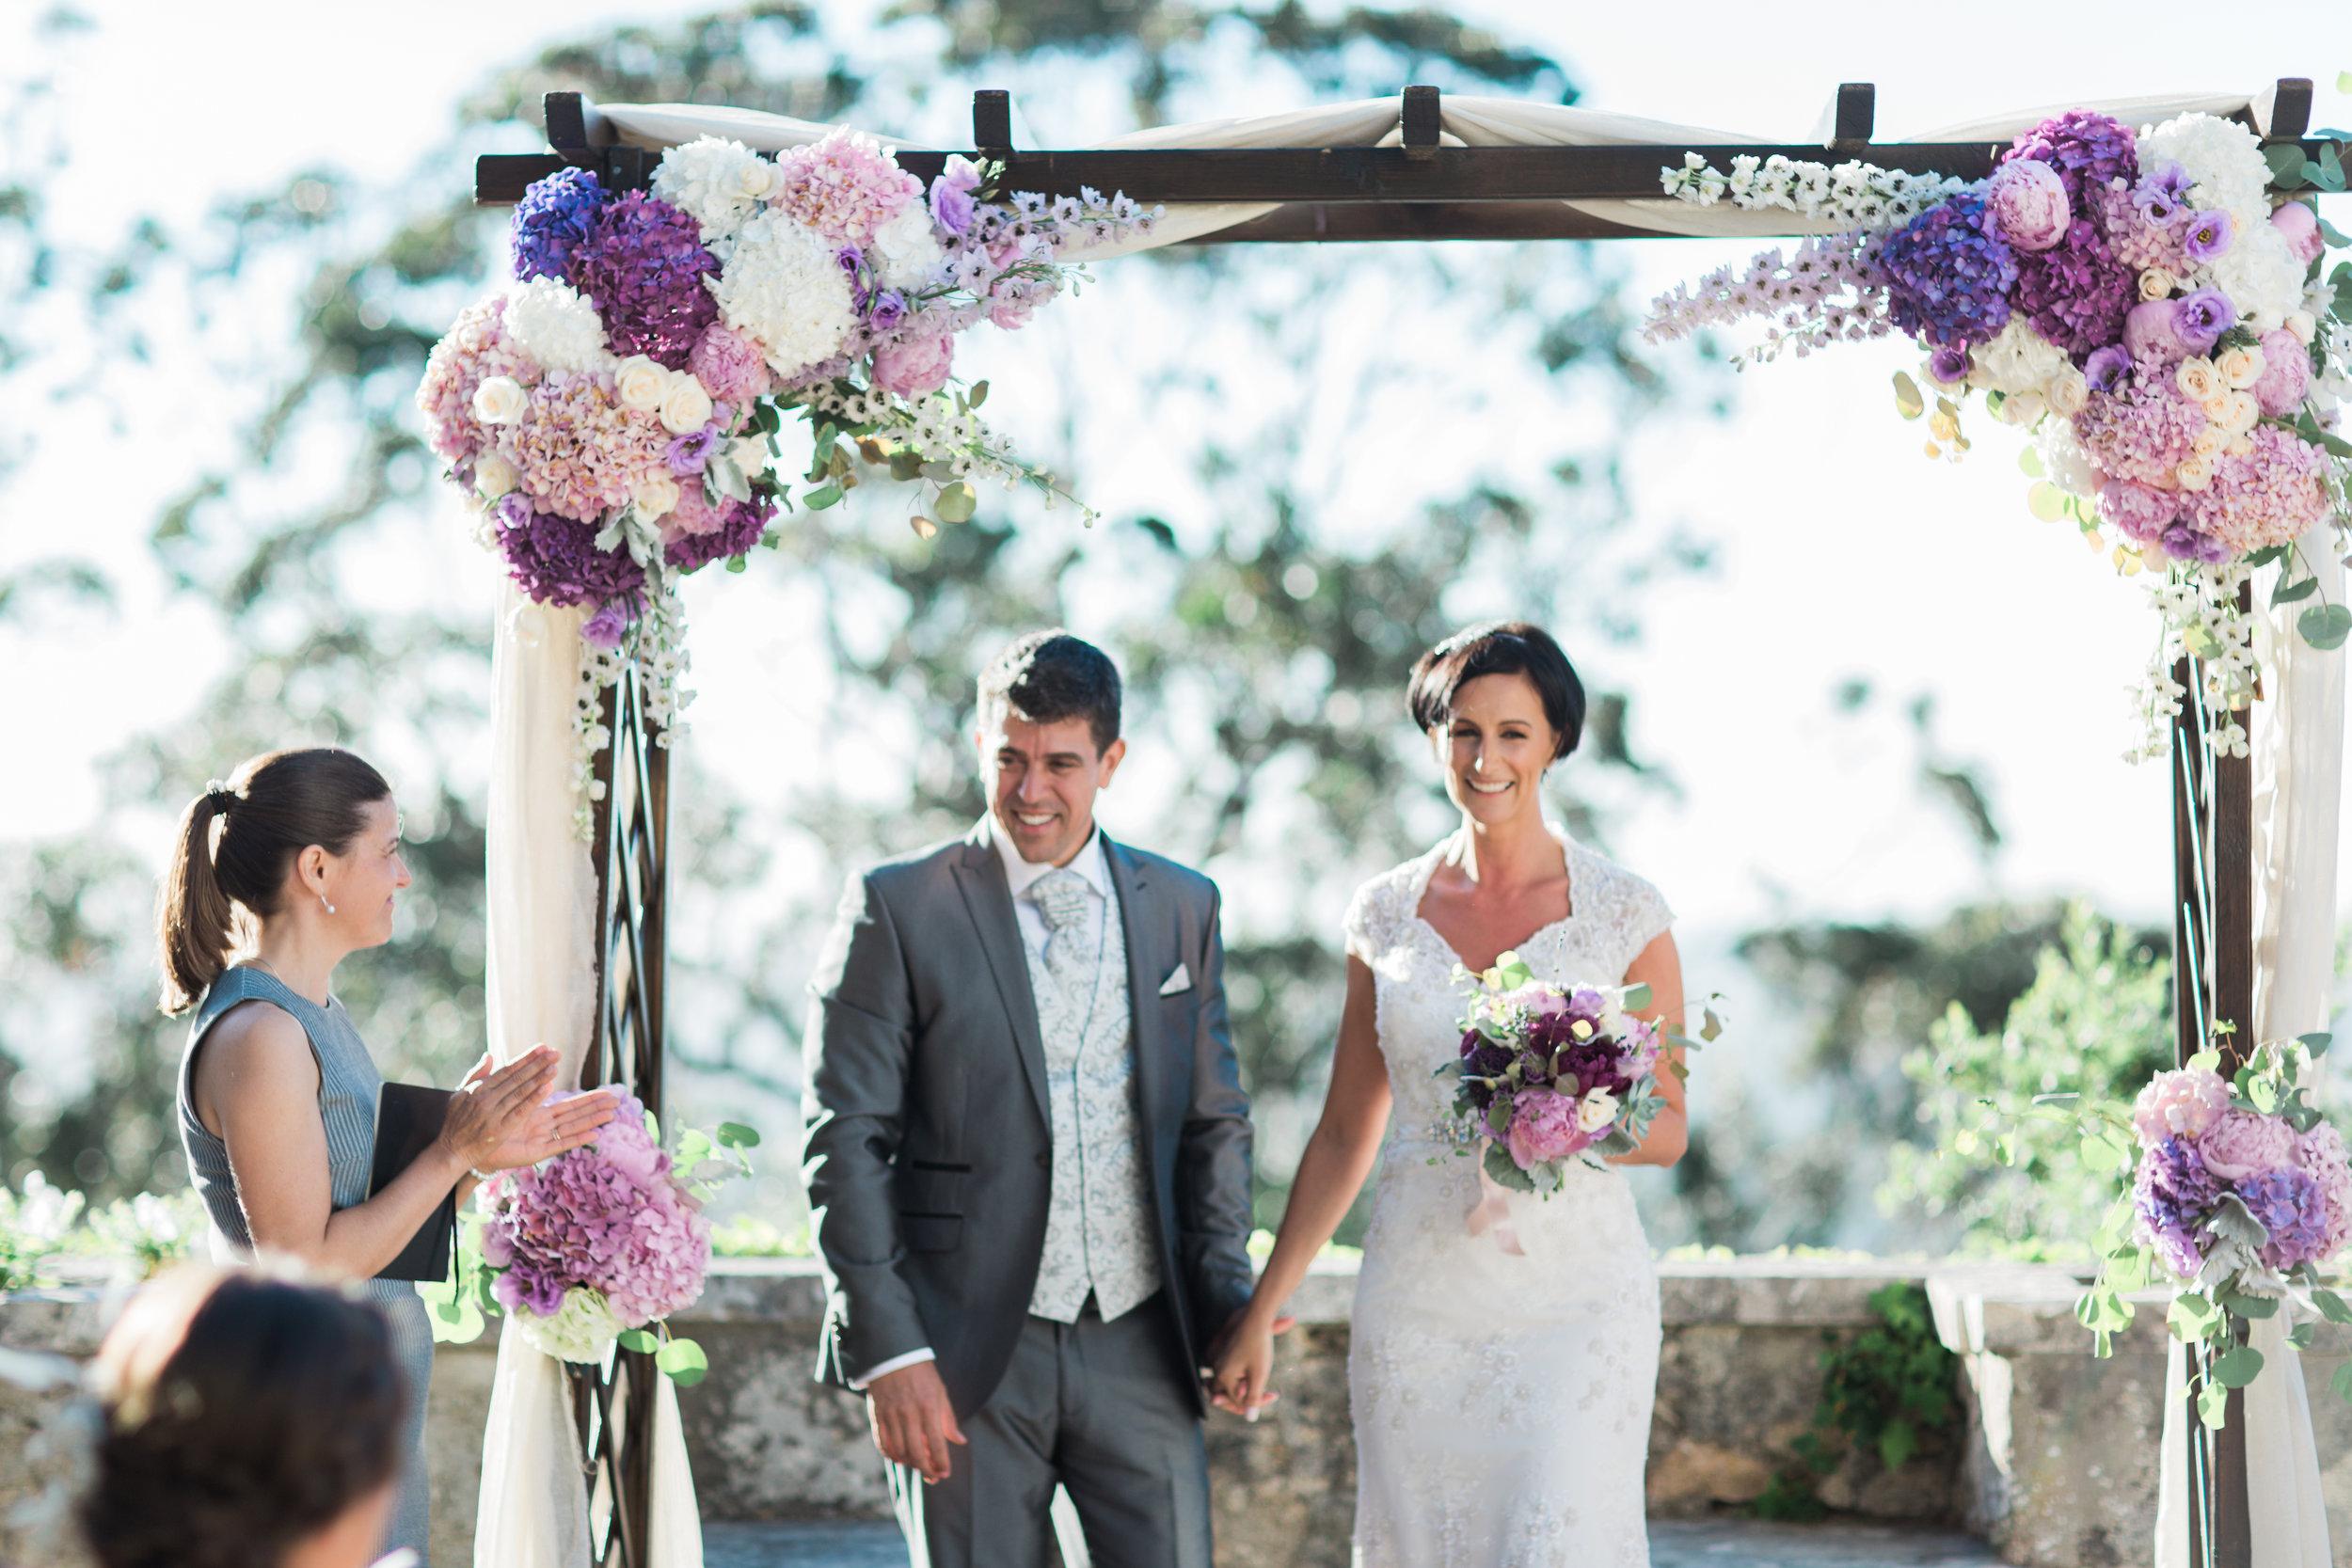 26 mariarao-wedding-palacio-seteais-148.jpg